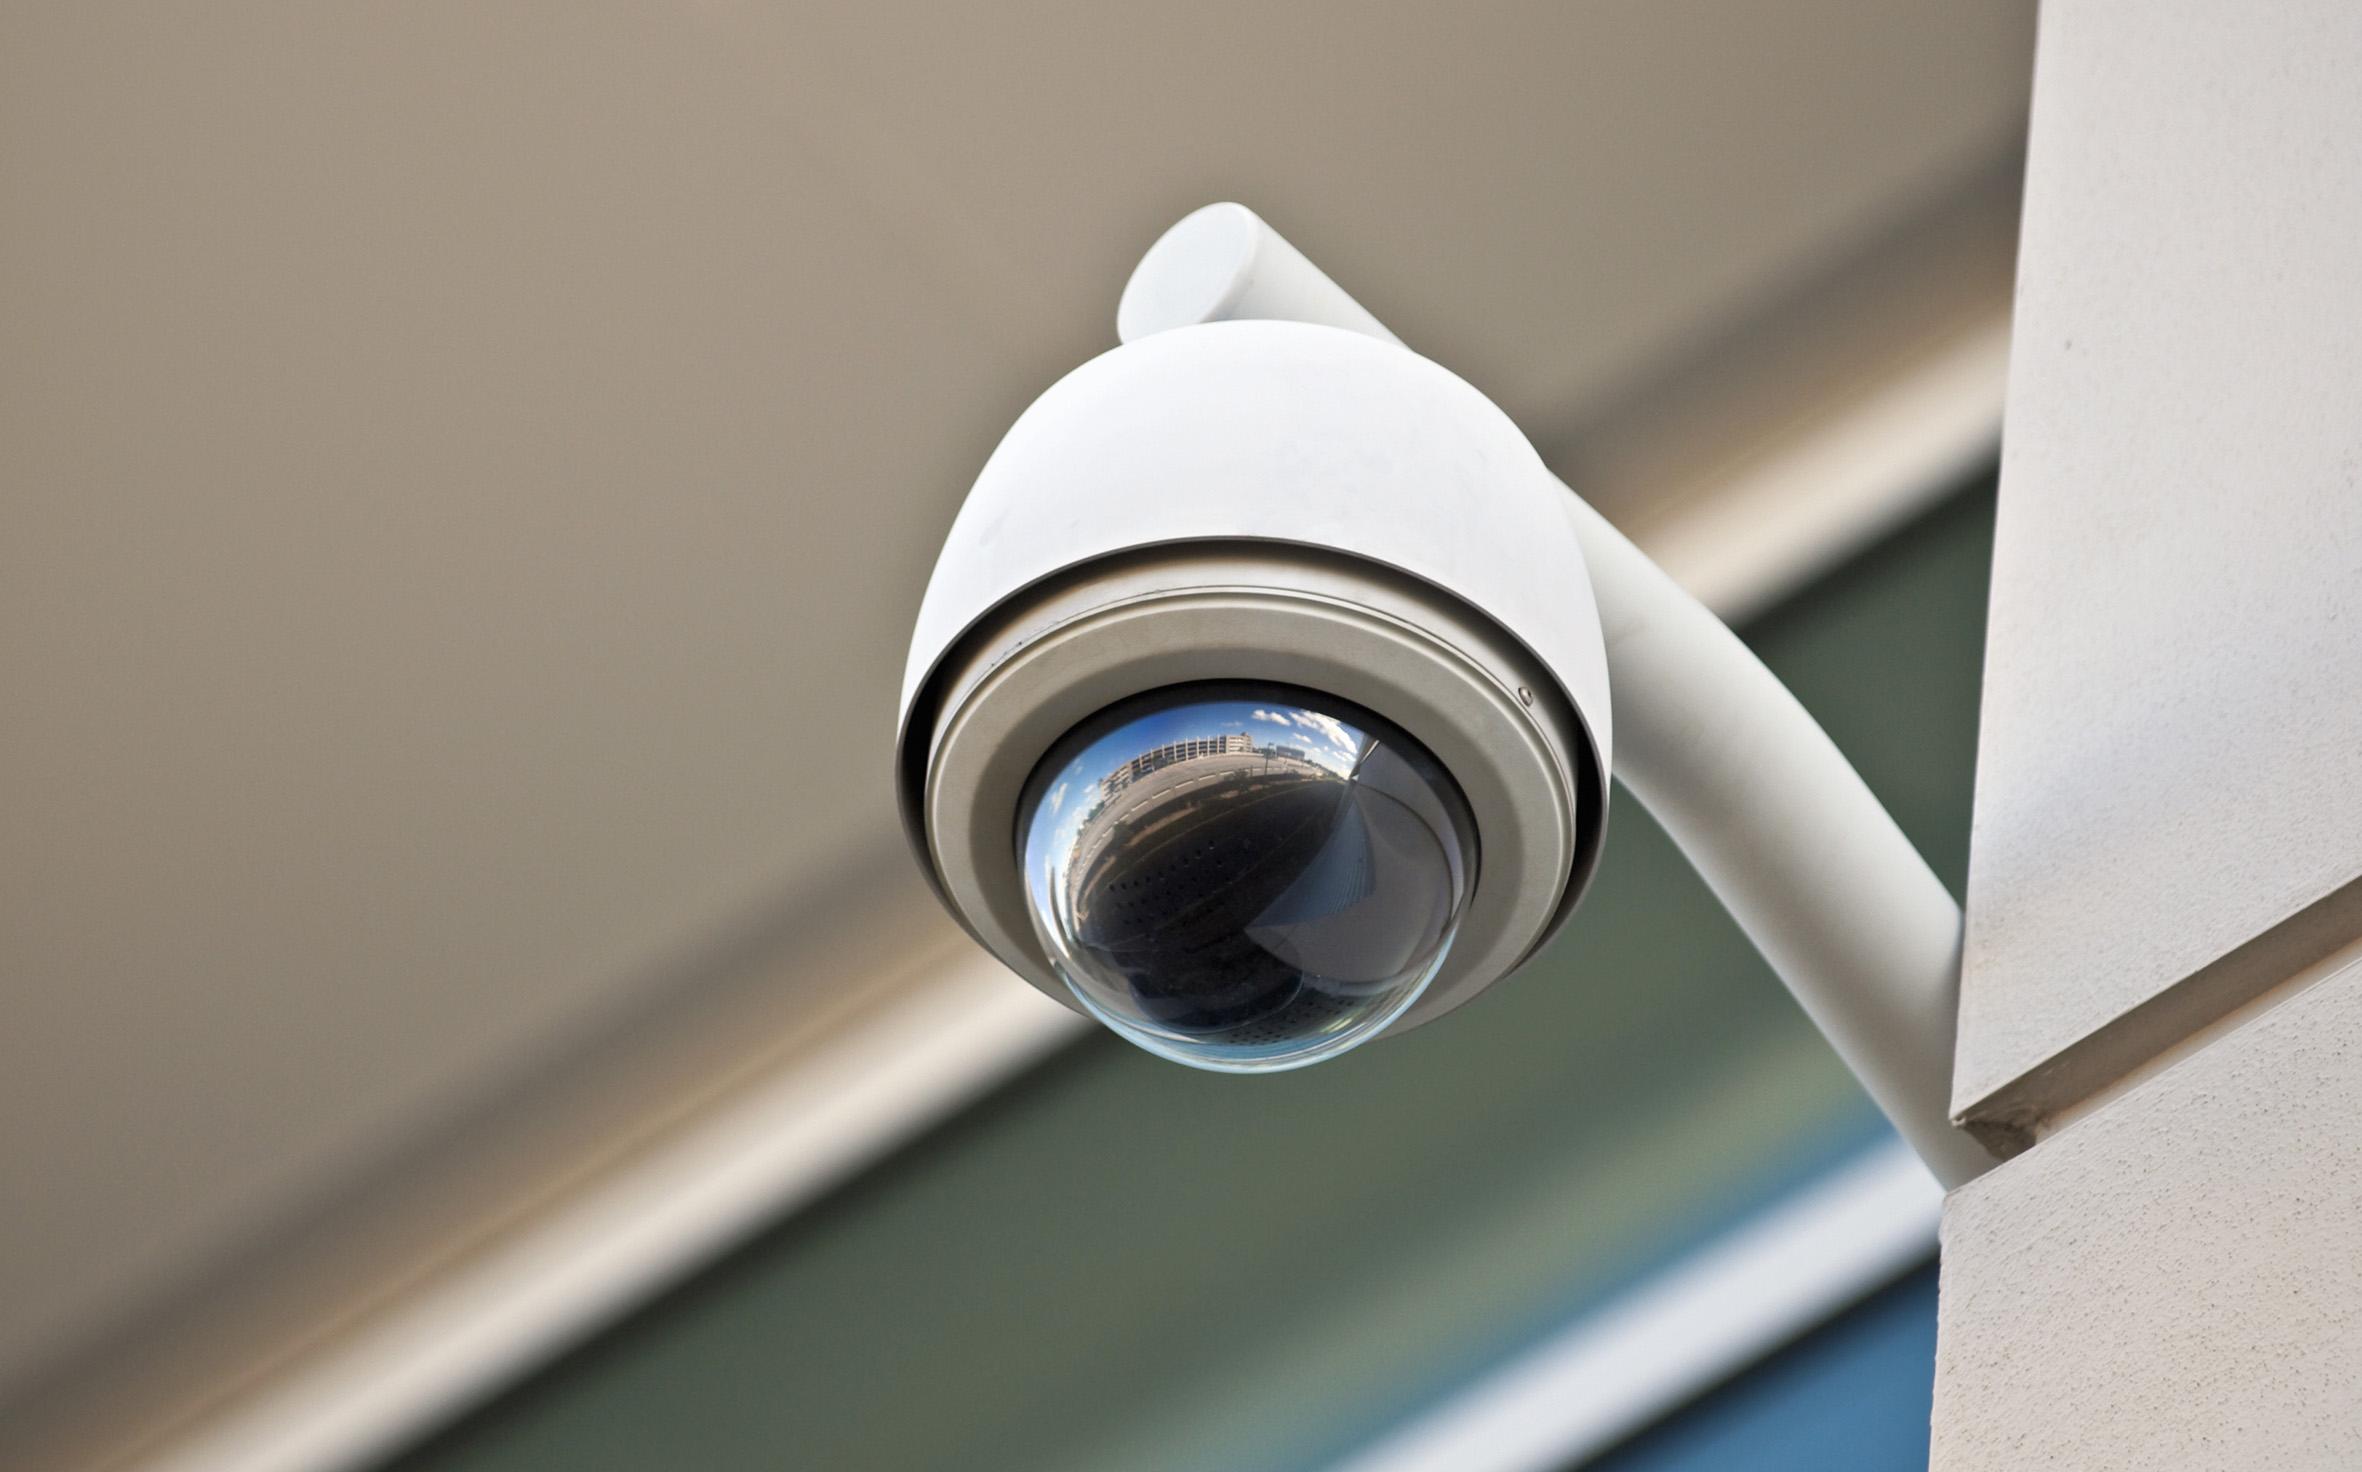 CAMERA SURVEILLANCE / CCTV